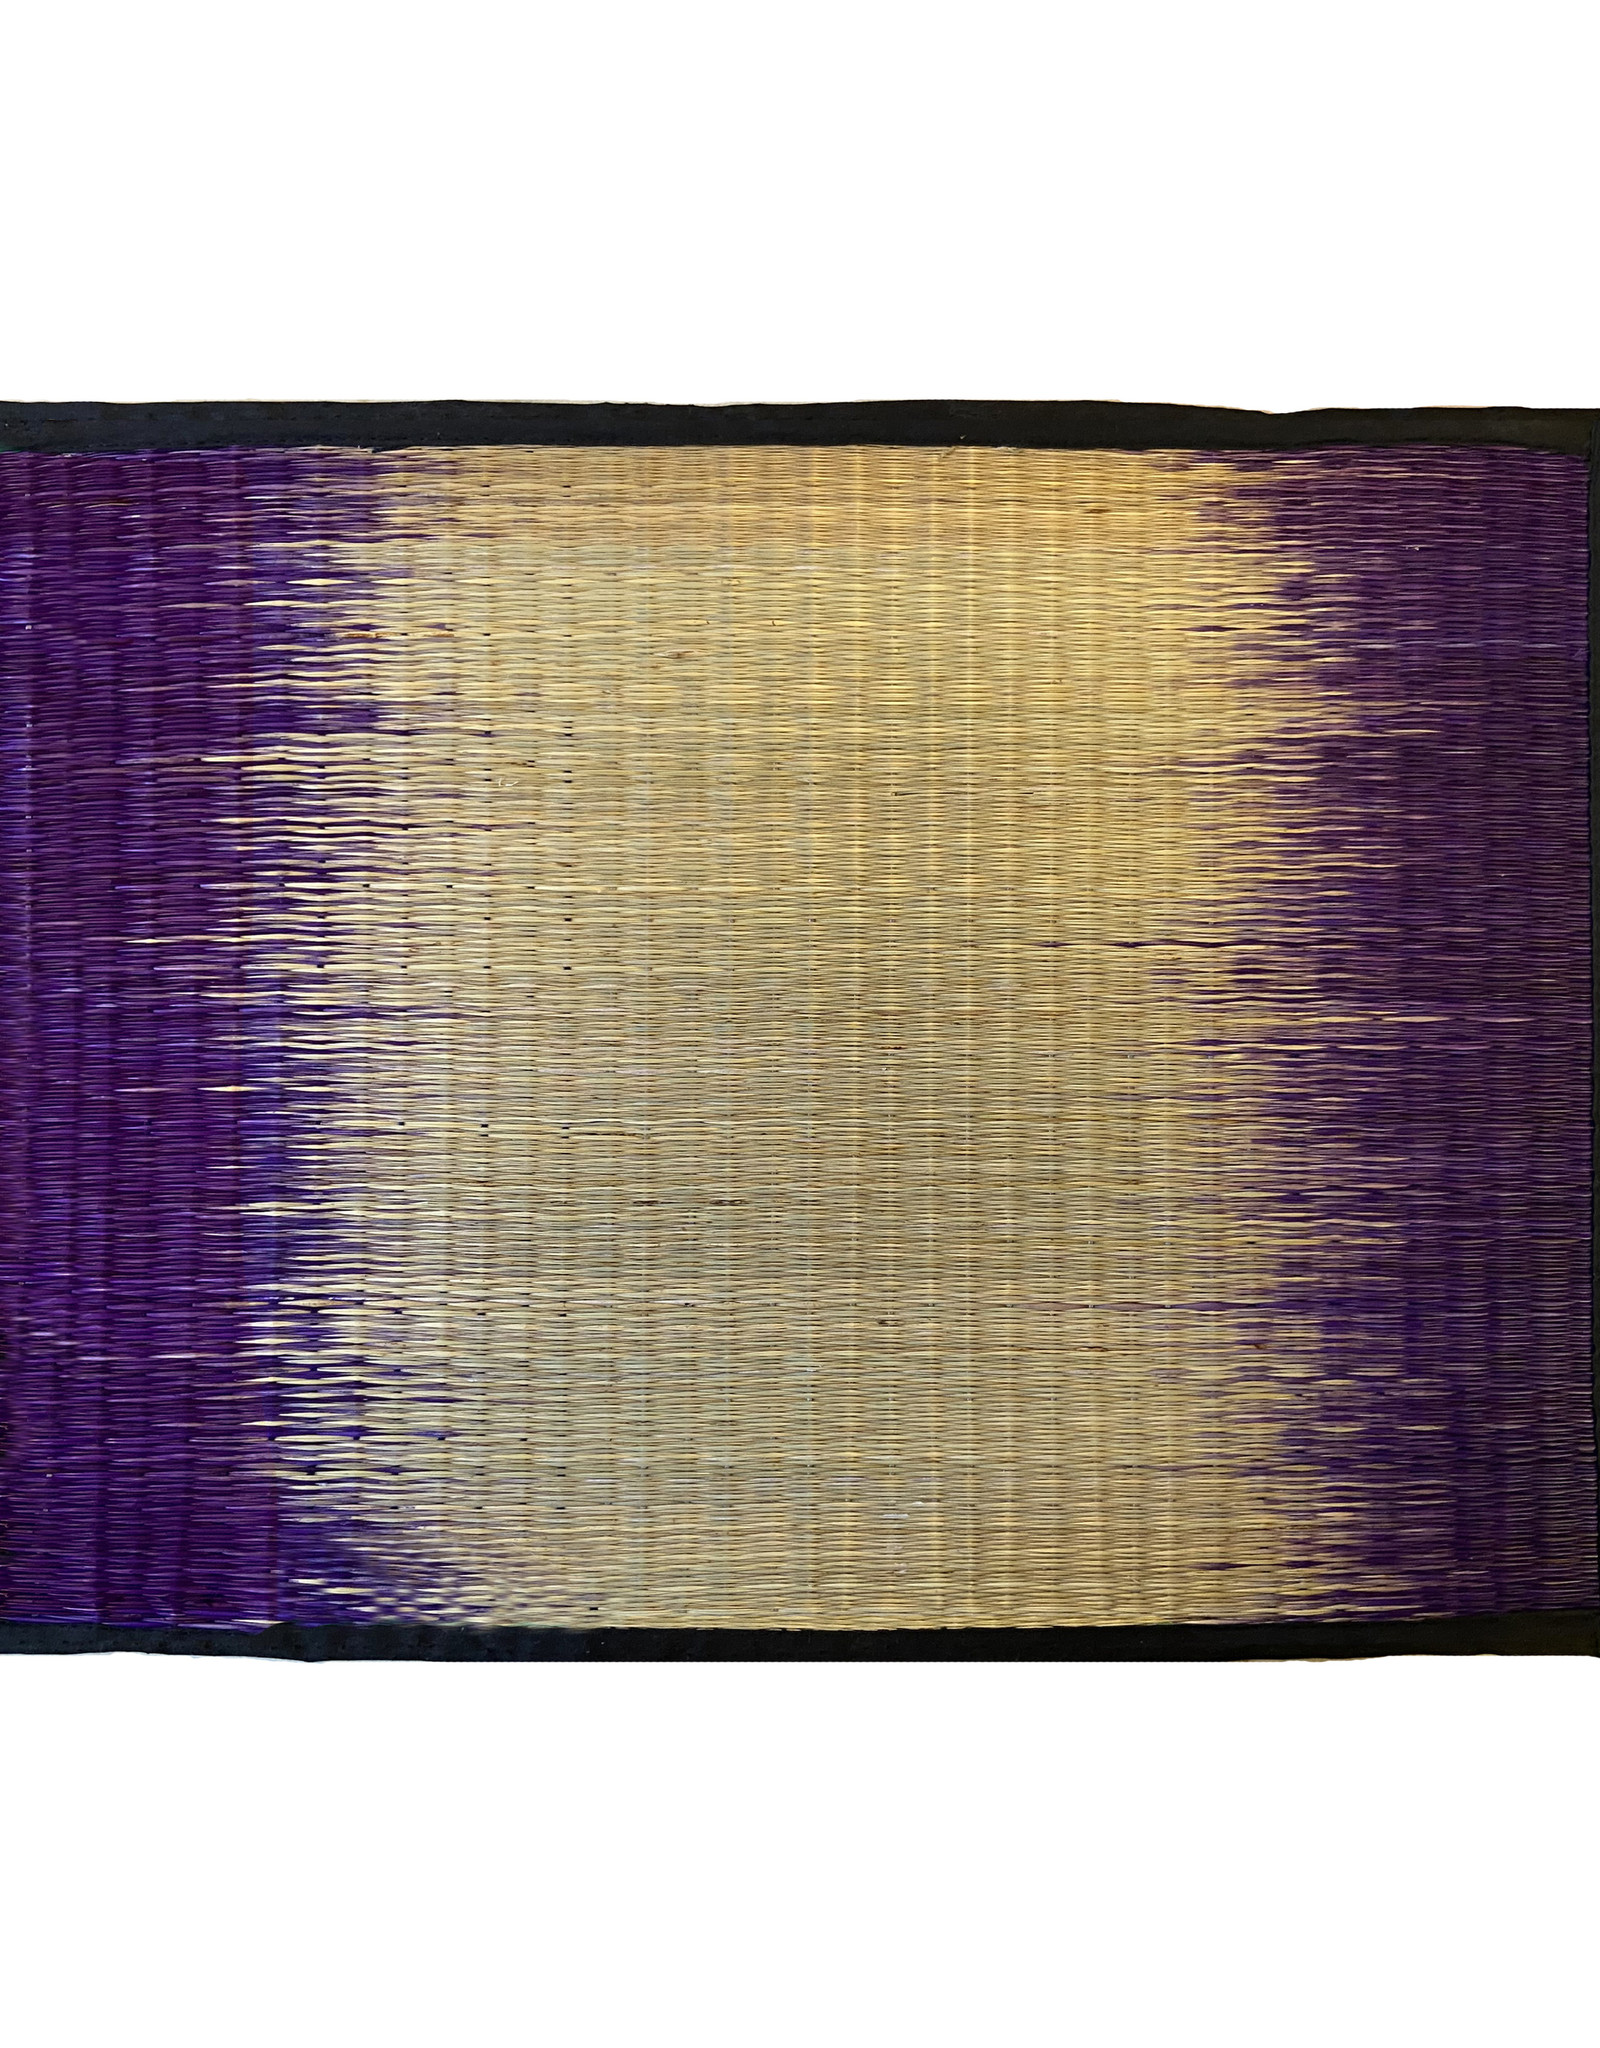 Sarany Shop Sarany shop ikat purple placemat